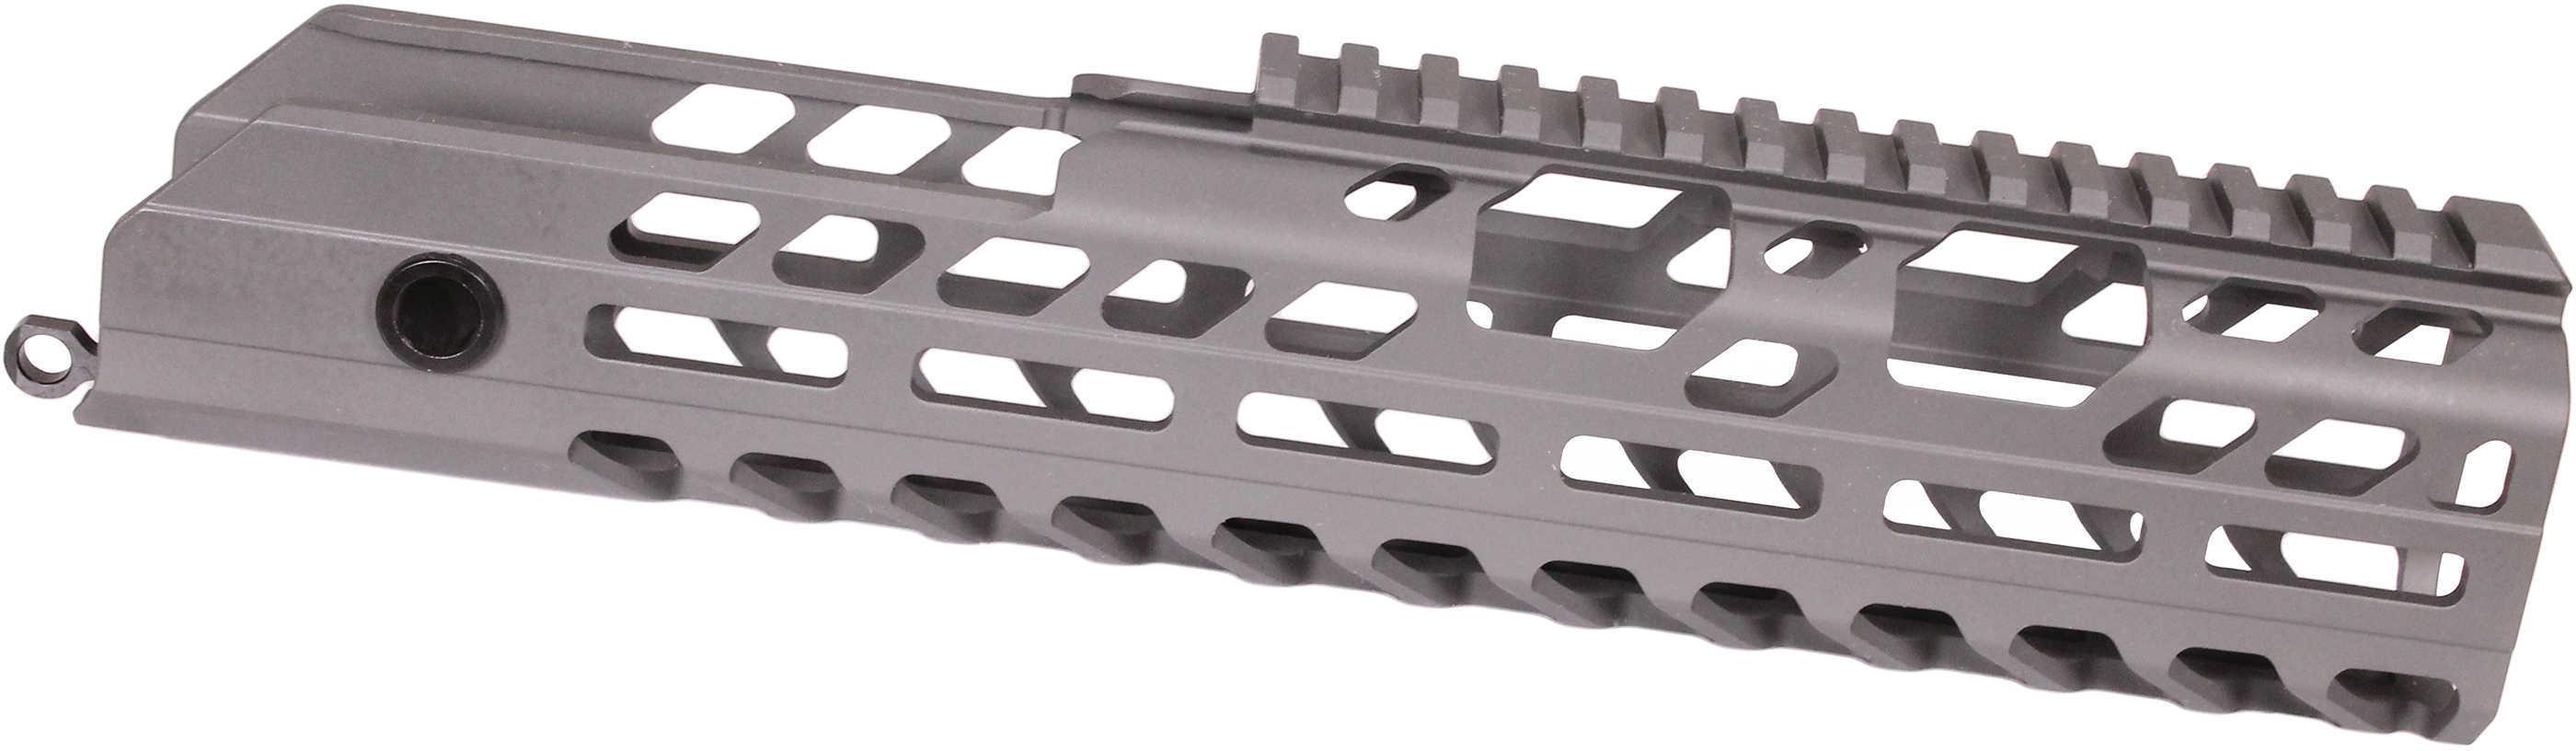 Sig Sauer MCX Handguard Aluminum, Rifle, M-Lok, Gray